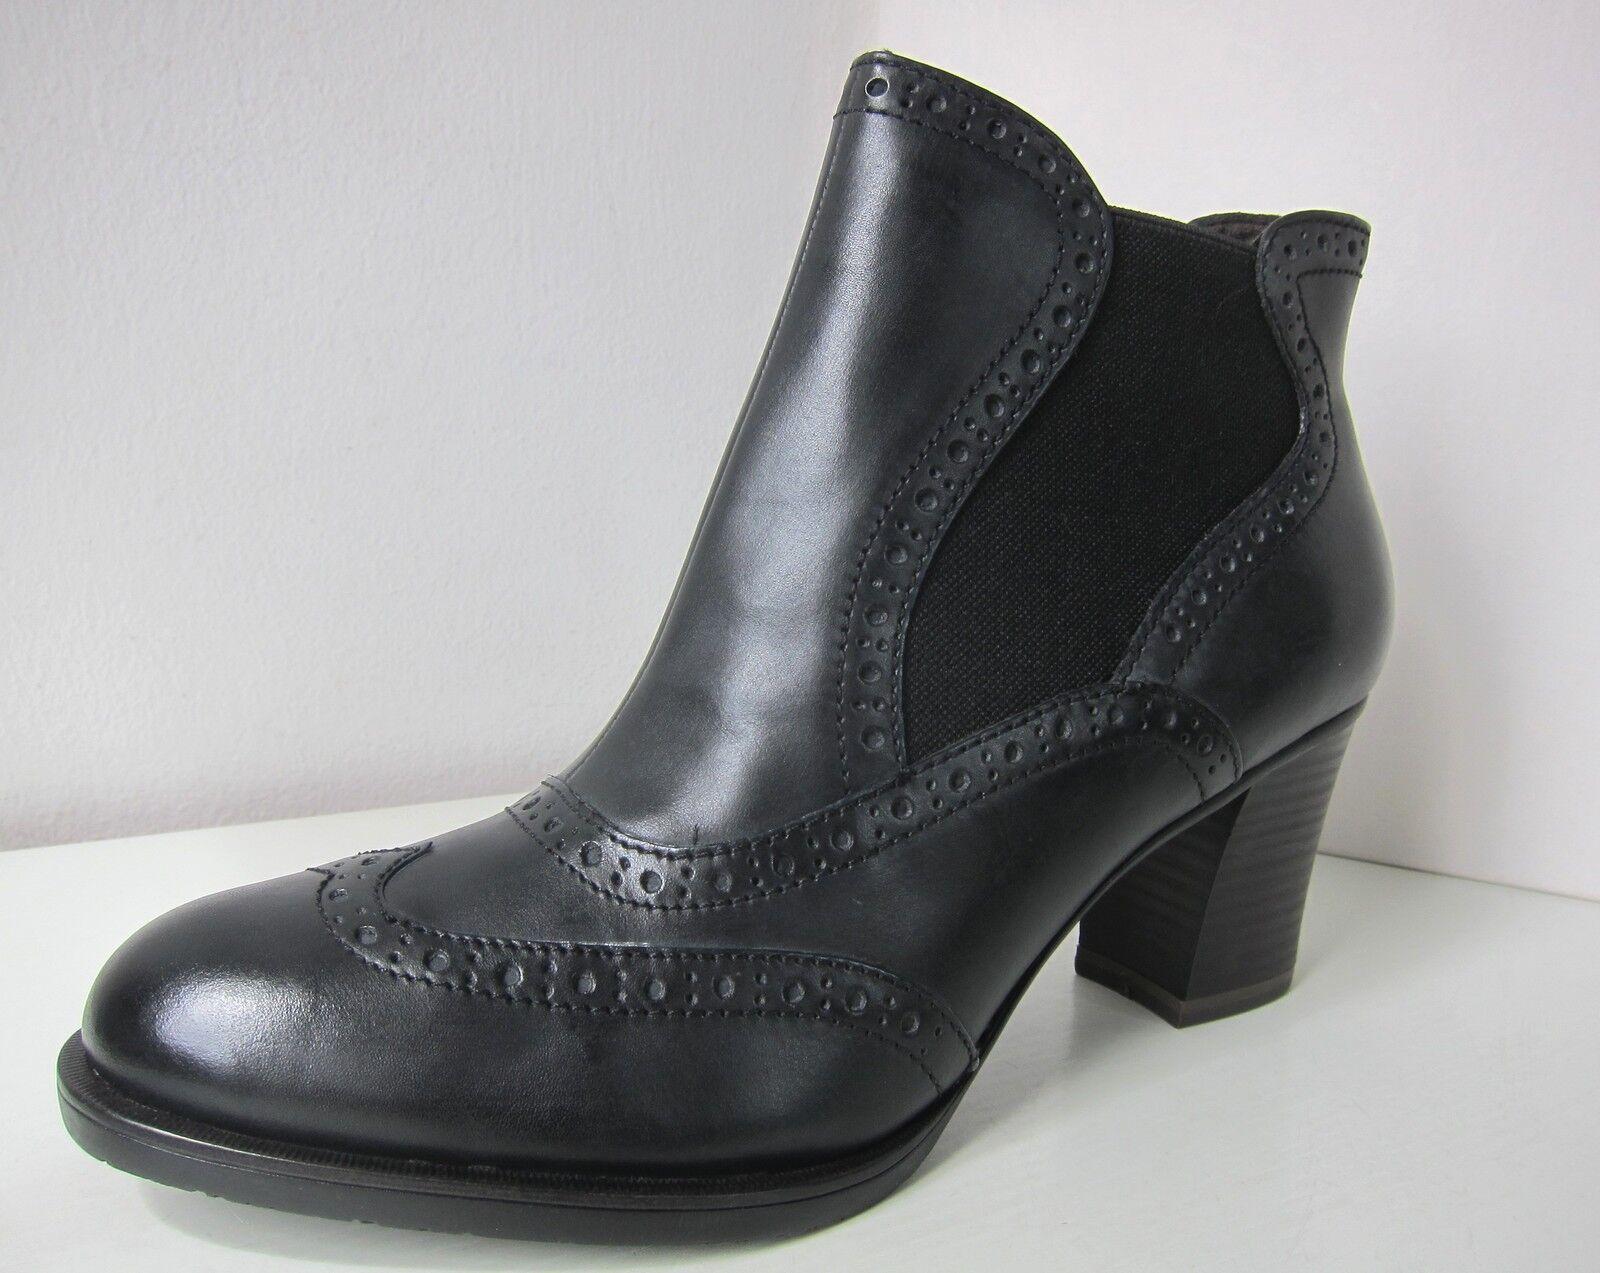 Tamaris Leder Stiefel bootee Stiefelette schwarz Gr 41 ankle Stiefel bootee Stiefel schwarz Leder 46f71c